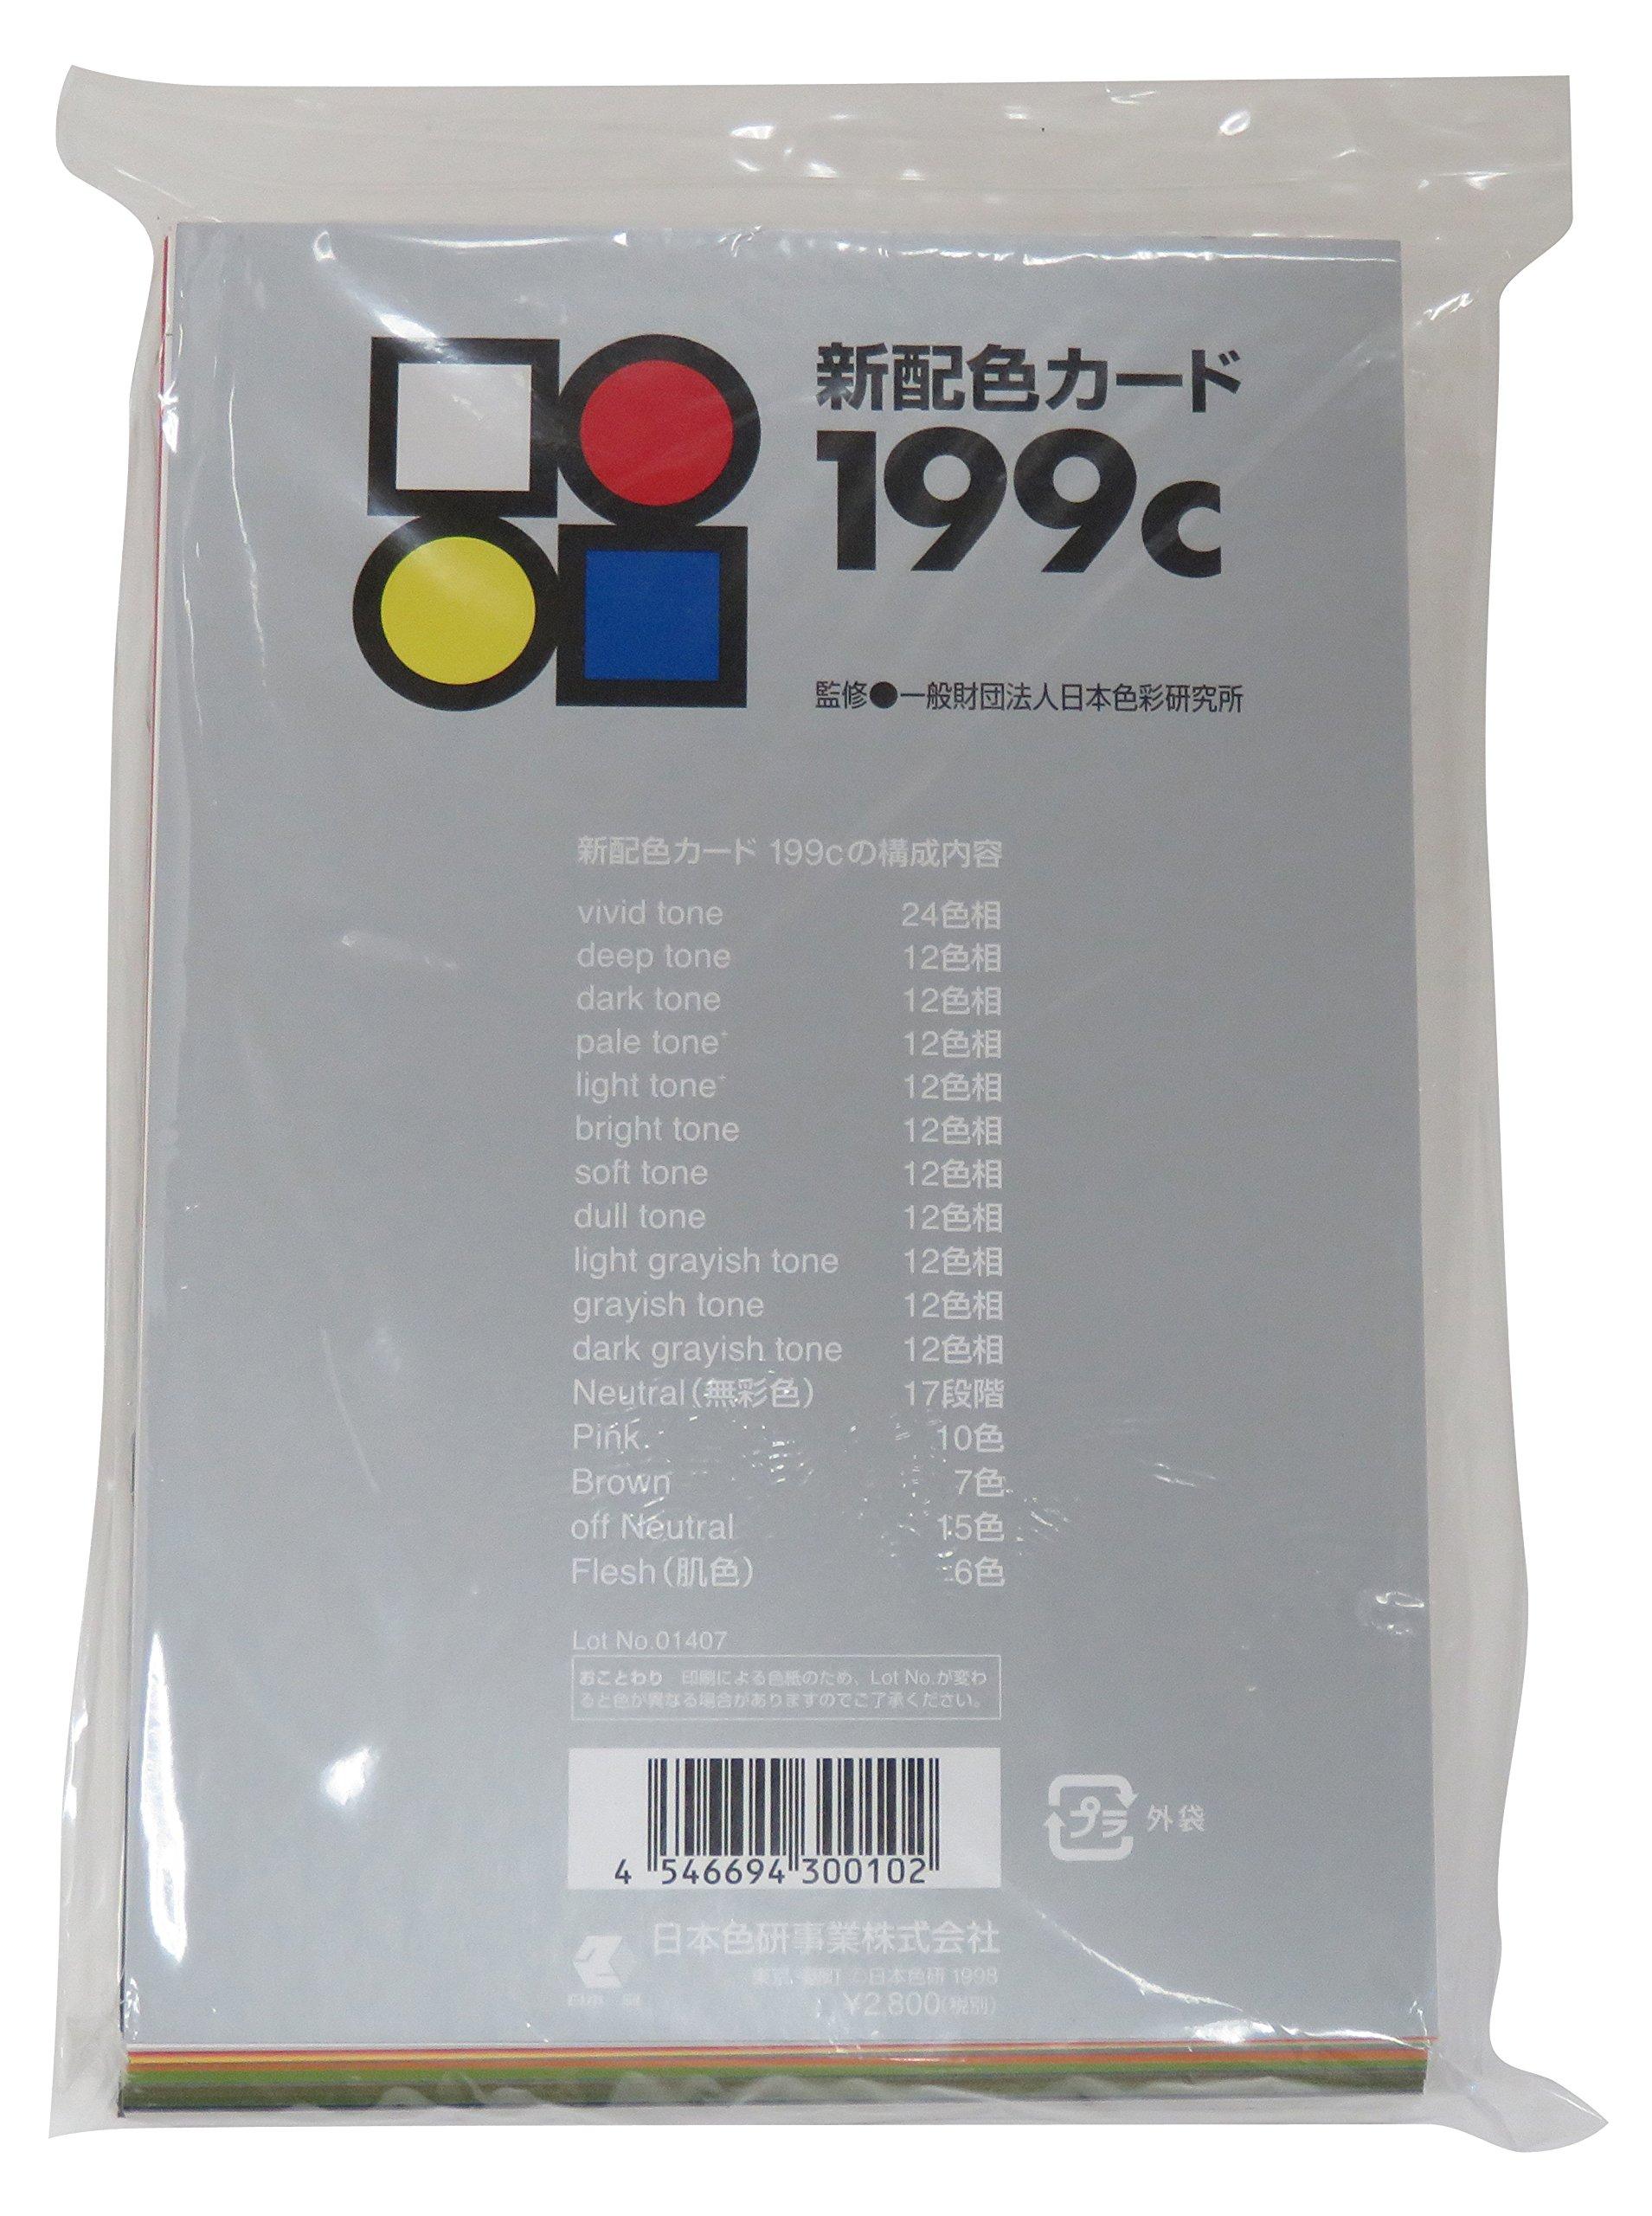 Japan Iroken new color scheme card 199c